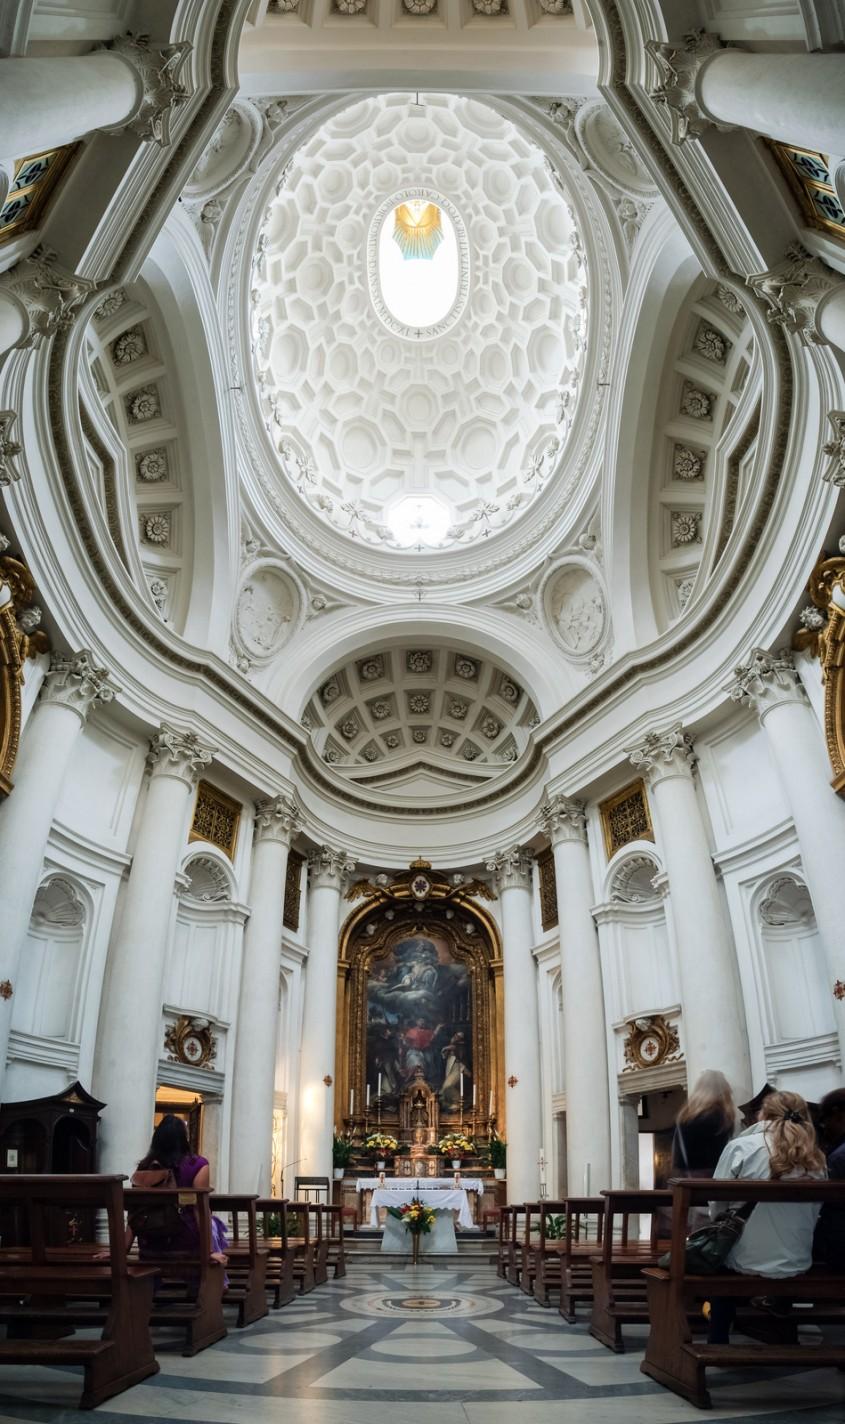 Biserica San Carlo alle Quattro Fontane Roma - interior - Lectia de arhitectura - emblemele stilului